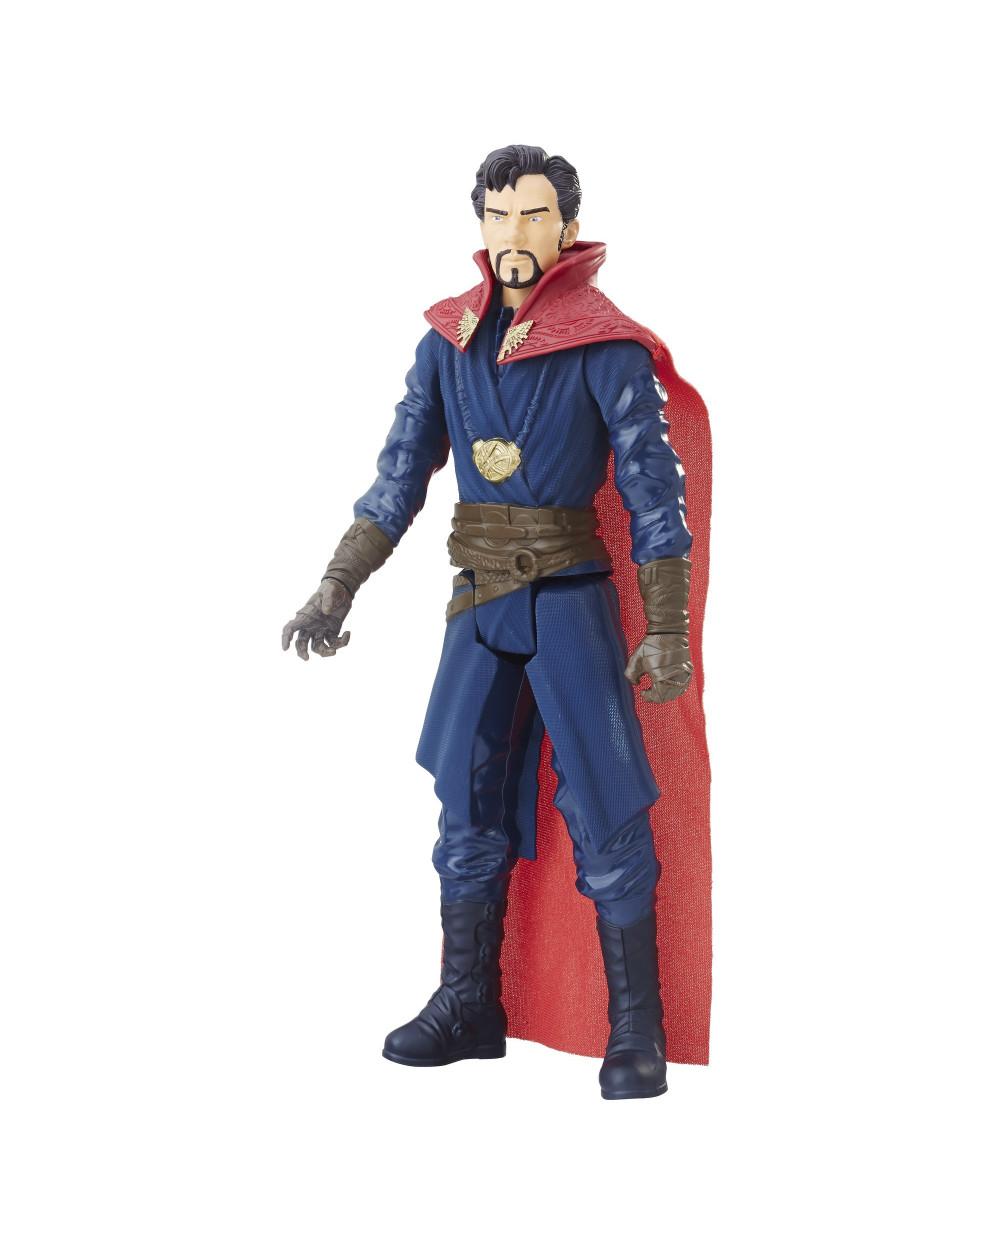 War Surtido Infinity Titan Avengers Acción Figuras De Hero 30cm UqSVLzMpG